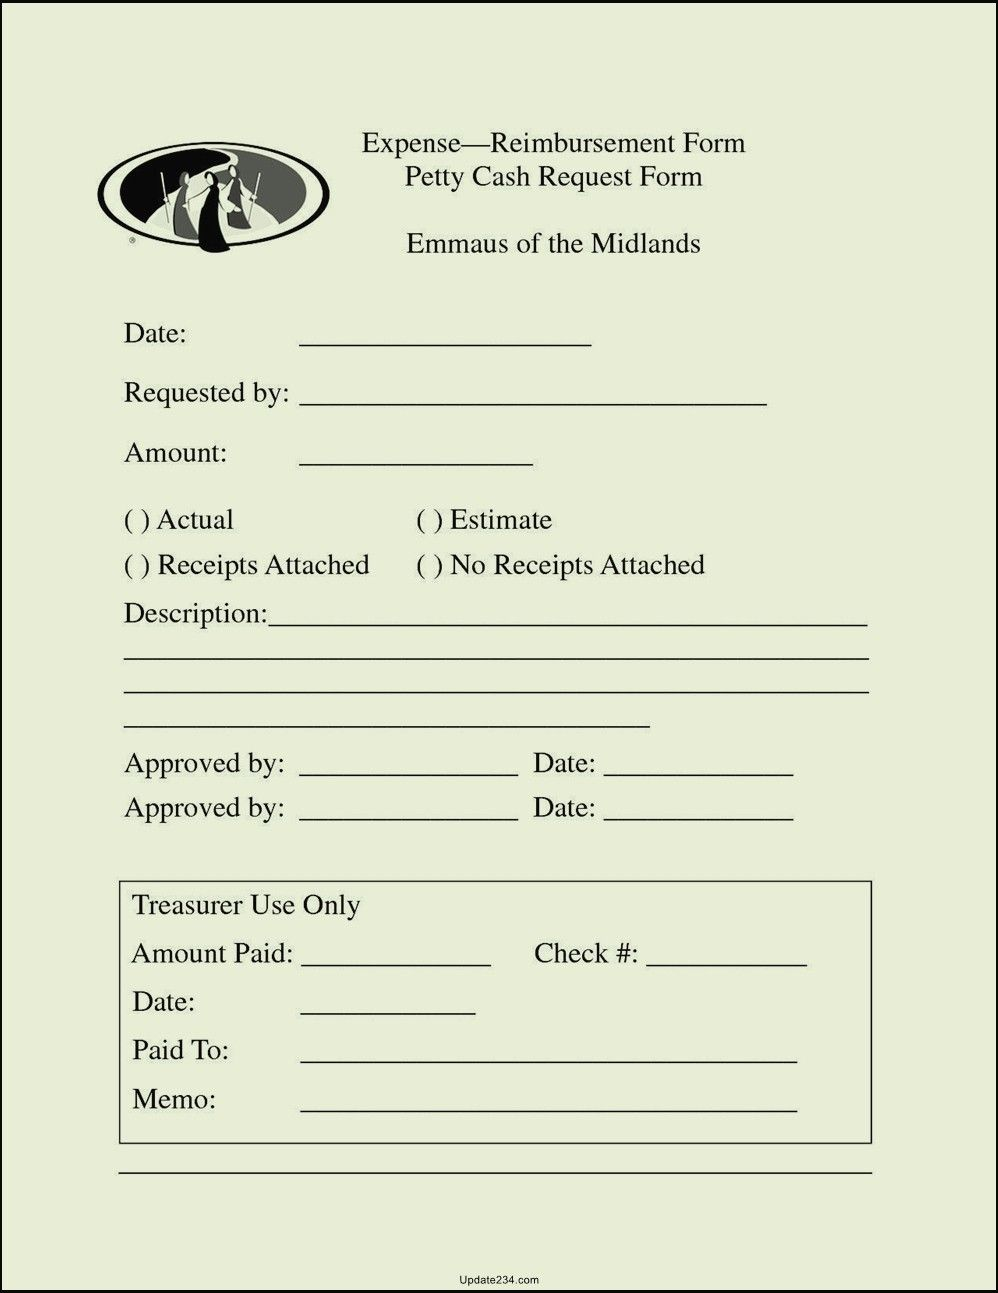 Petty Cash Request Form Template Unique Petty Cash Requisition Template Template Update234 Sign In Sheet Template Templates Sign Up Sheets